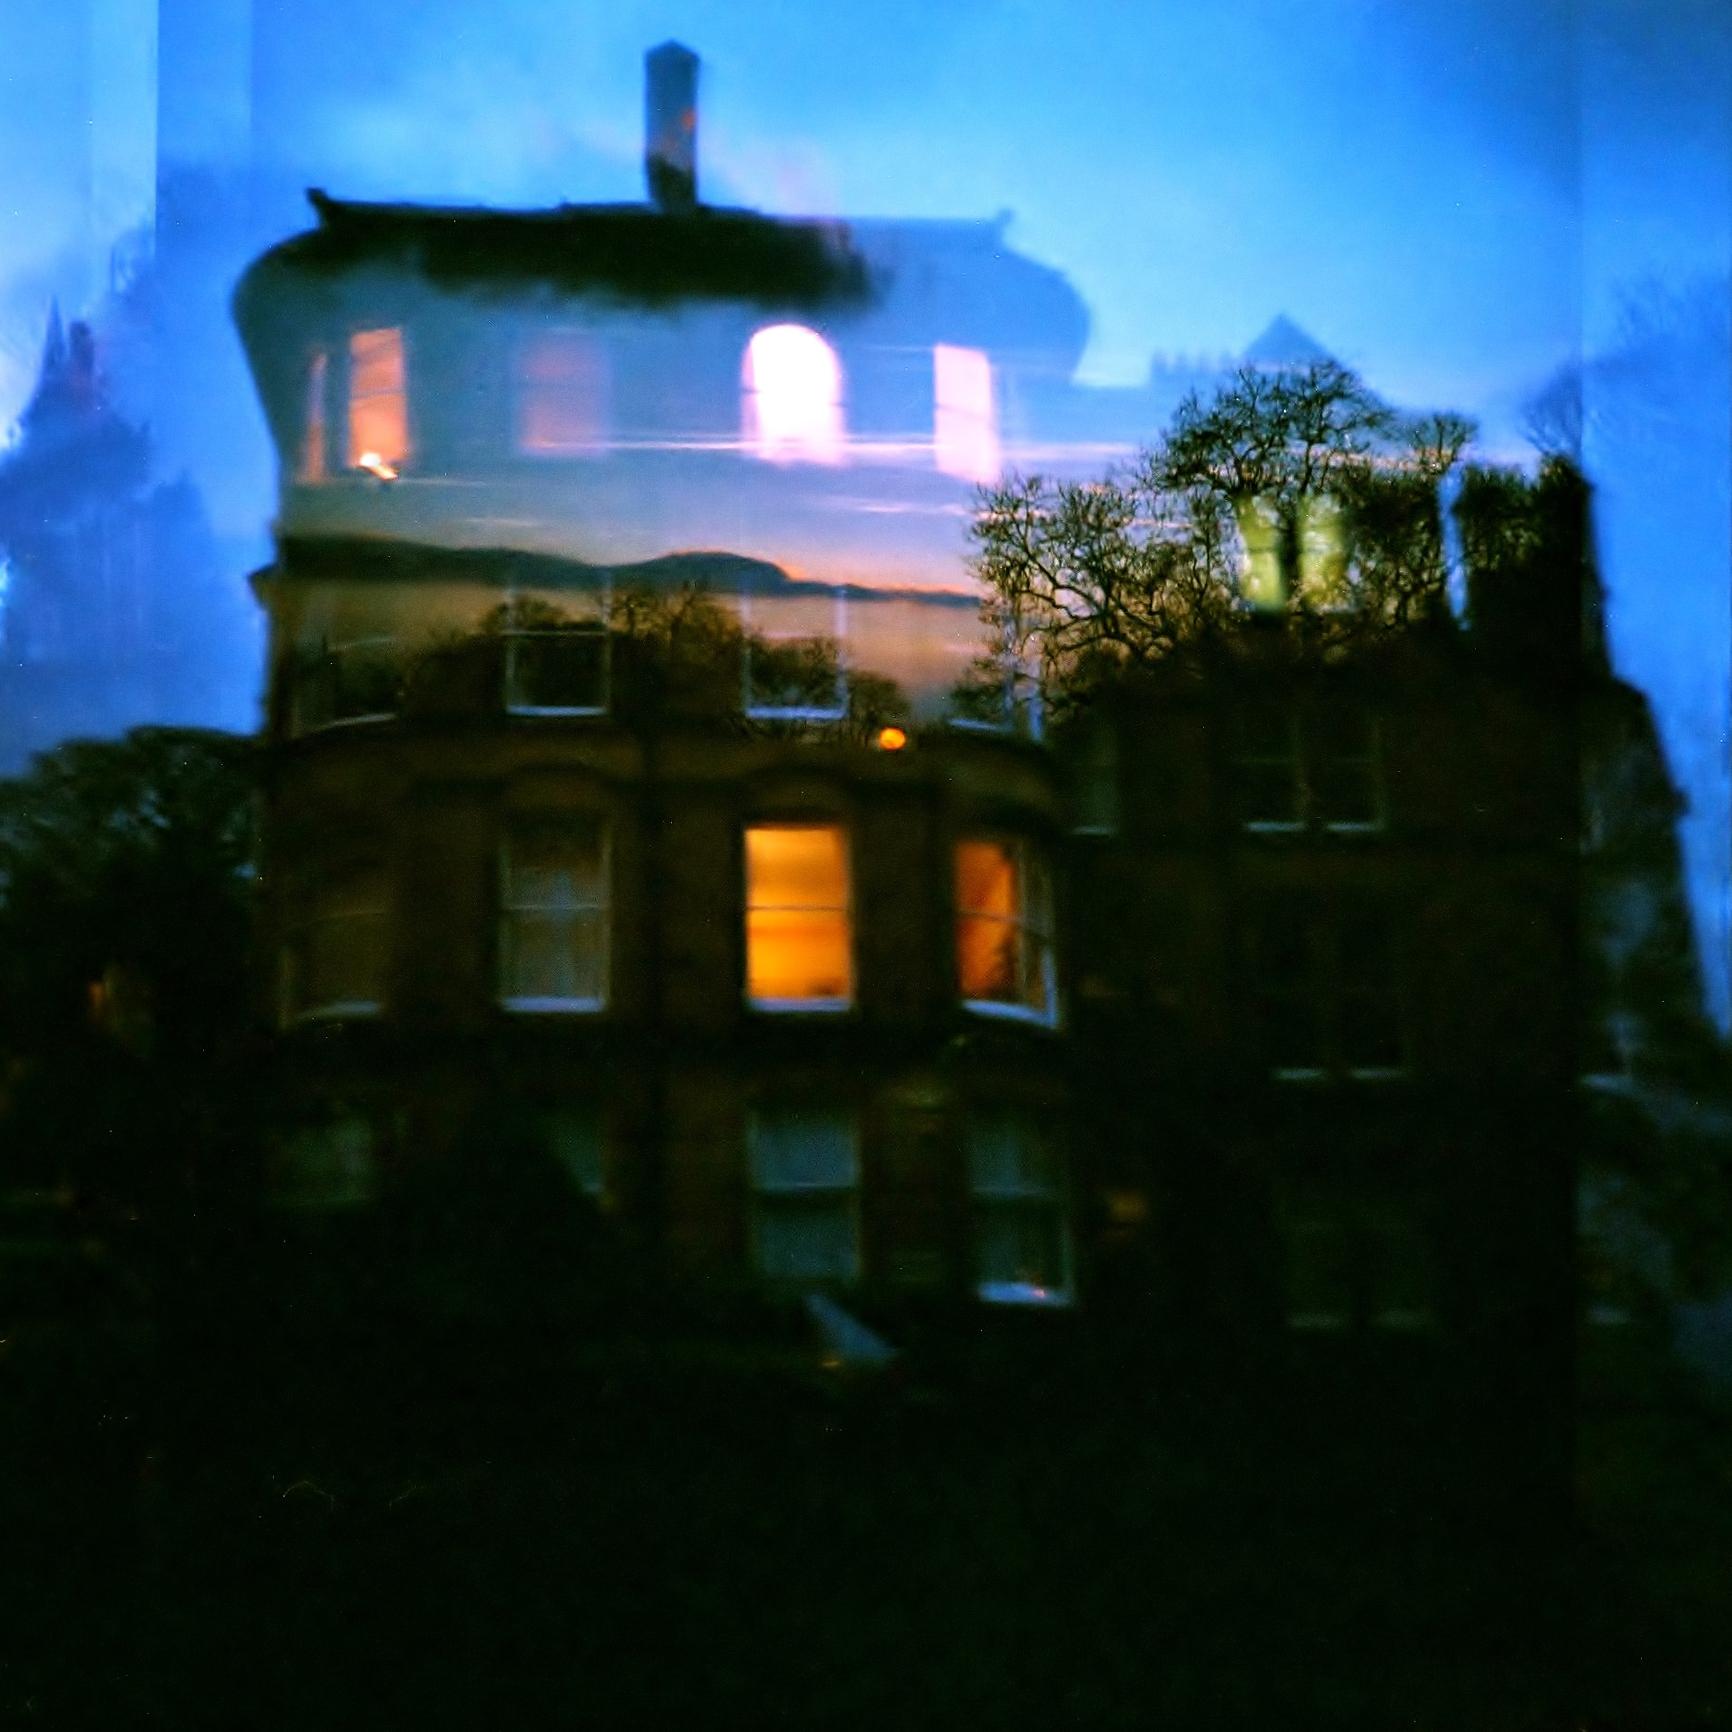 Southern Gothic,Diana F+,Expired Kodak Vericolour CN